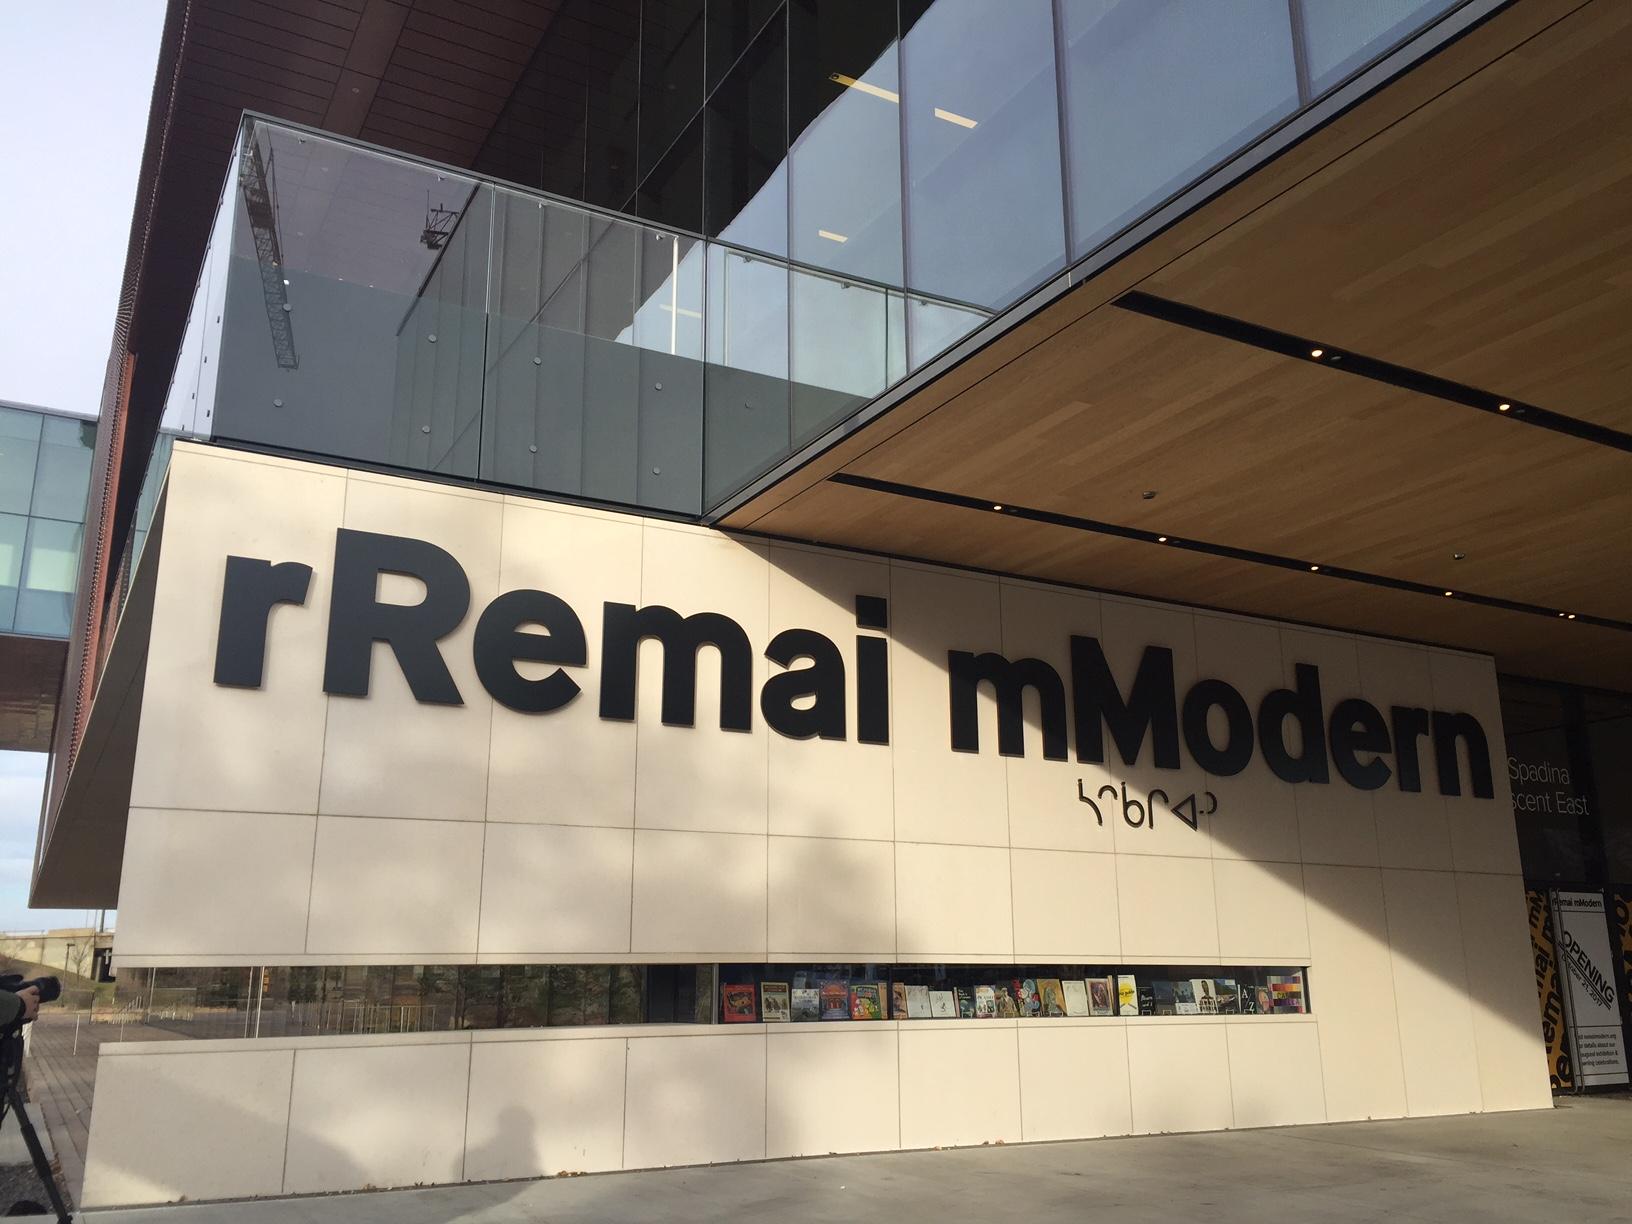 The main entrances to the Remai Modern art gallery in Saskatoon. (Daniella Ponticelli/650 CKOM)